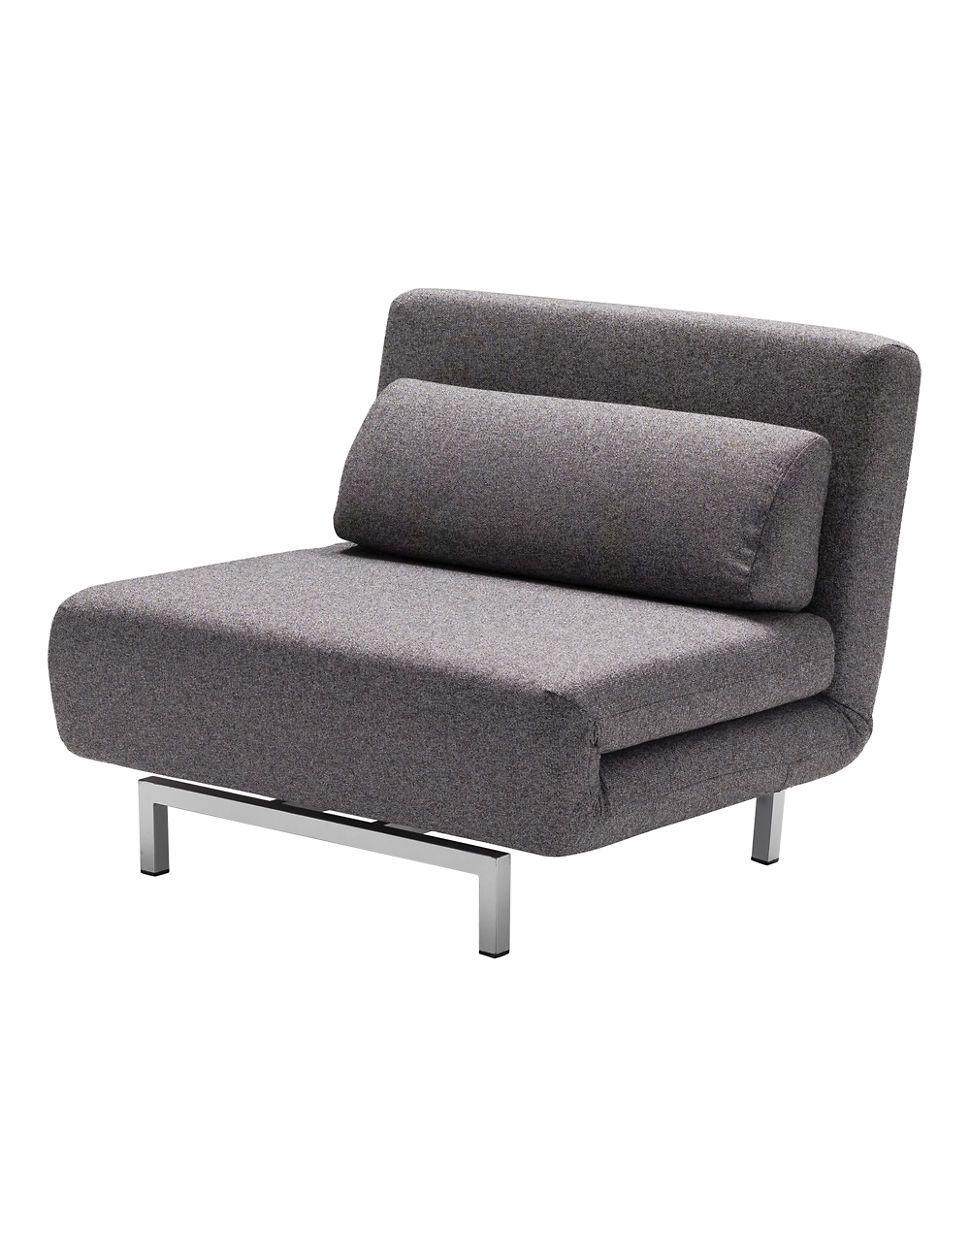 Home Sofas Iso Flip Chair Sofa Bed Hudson S Bay